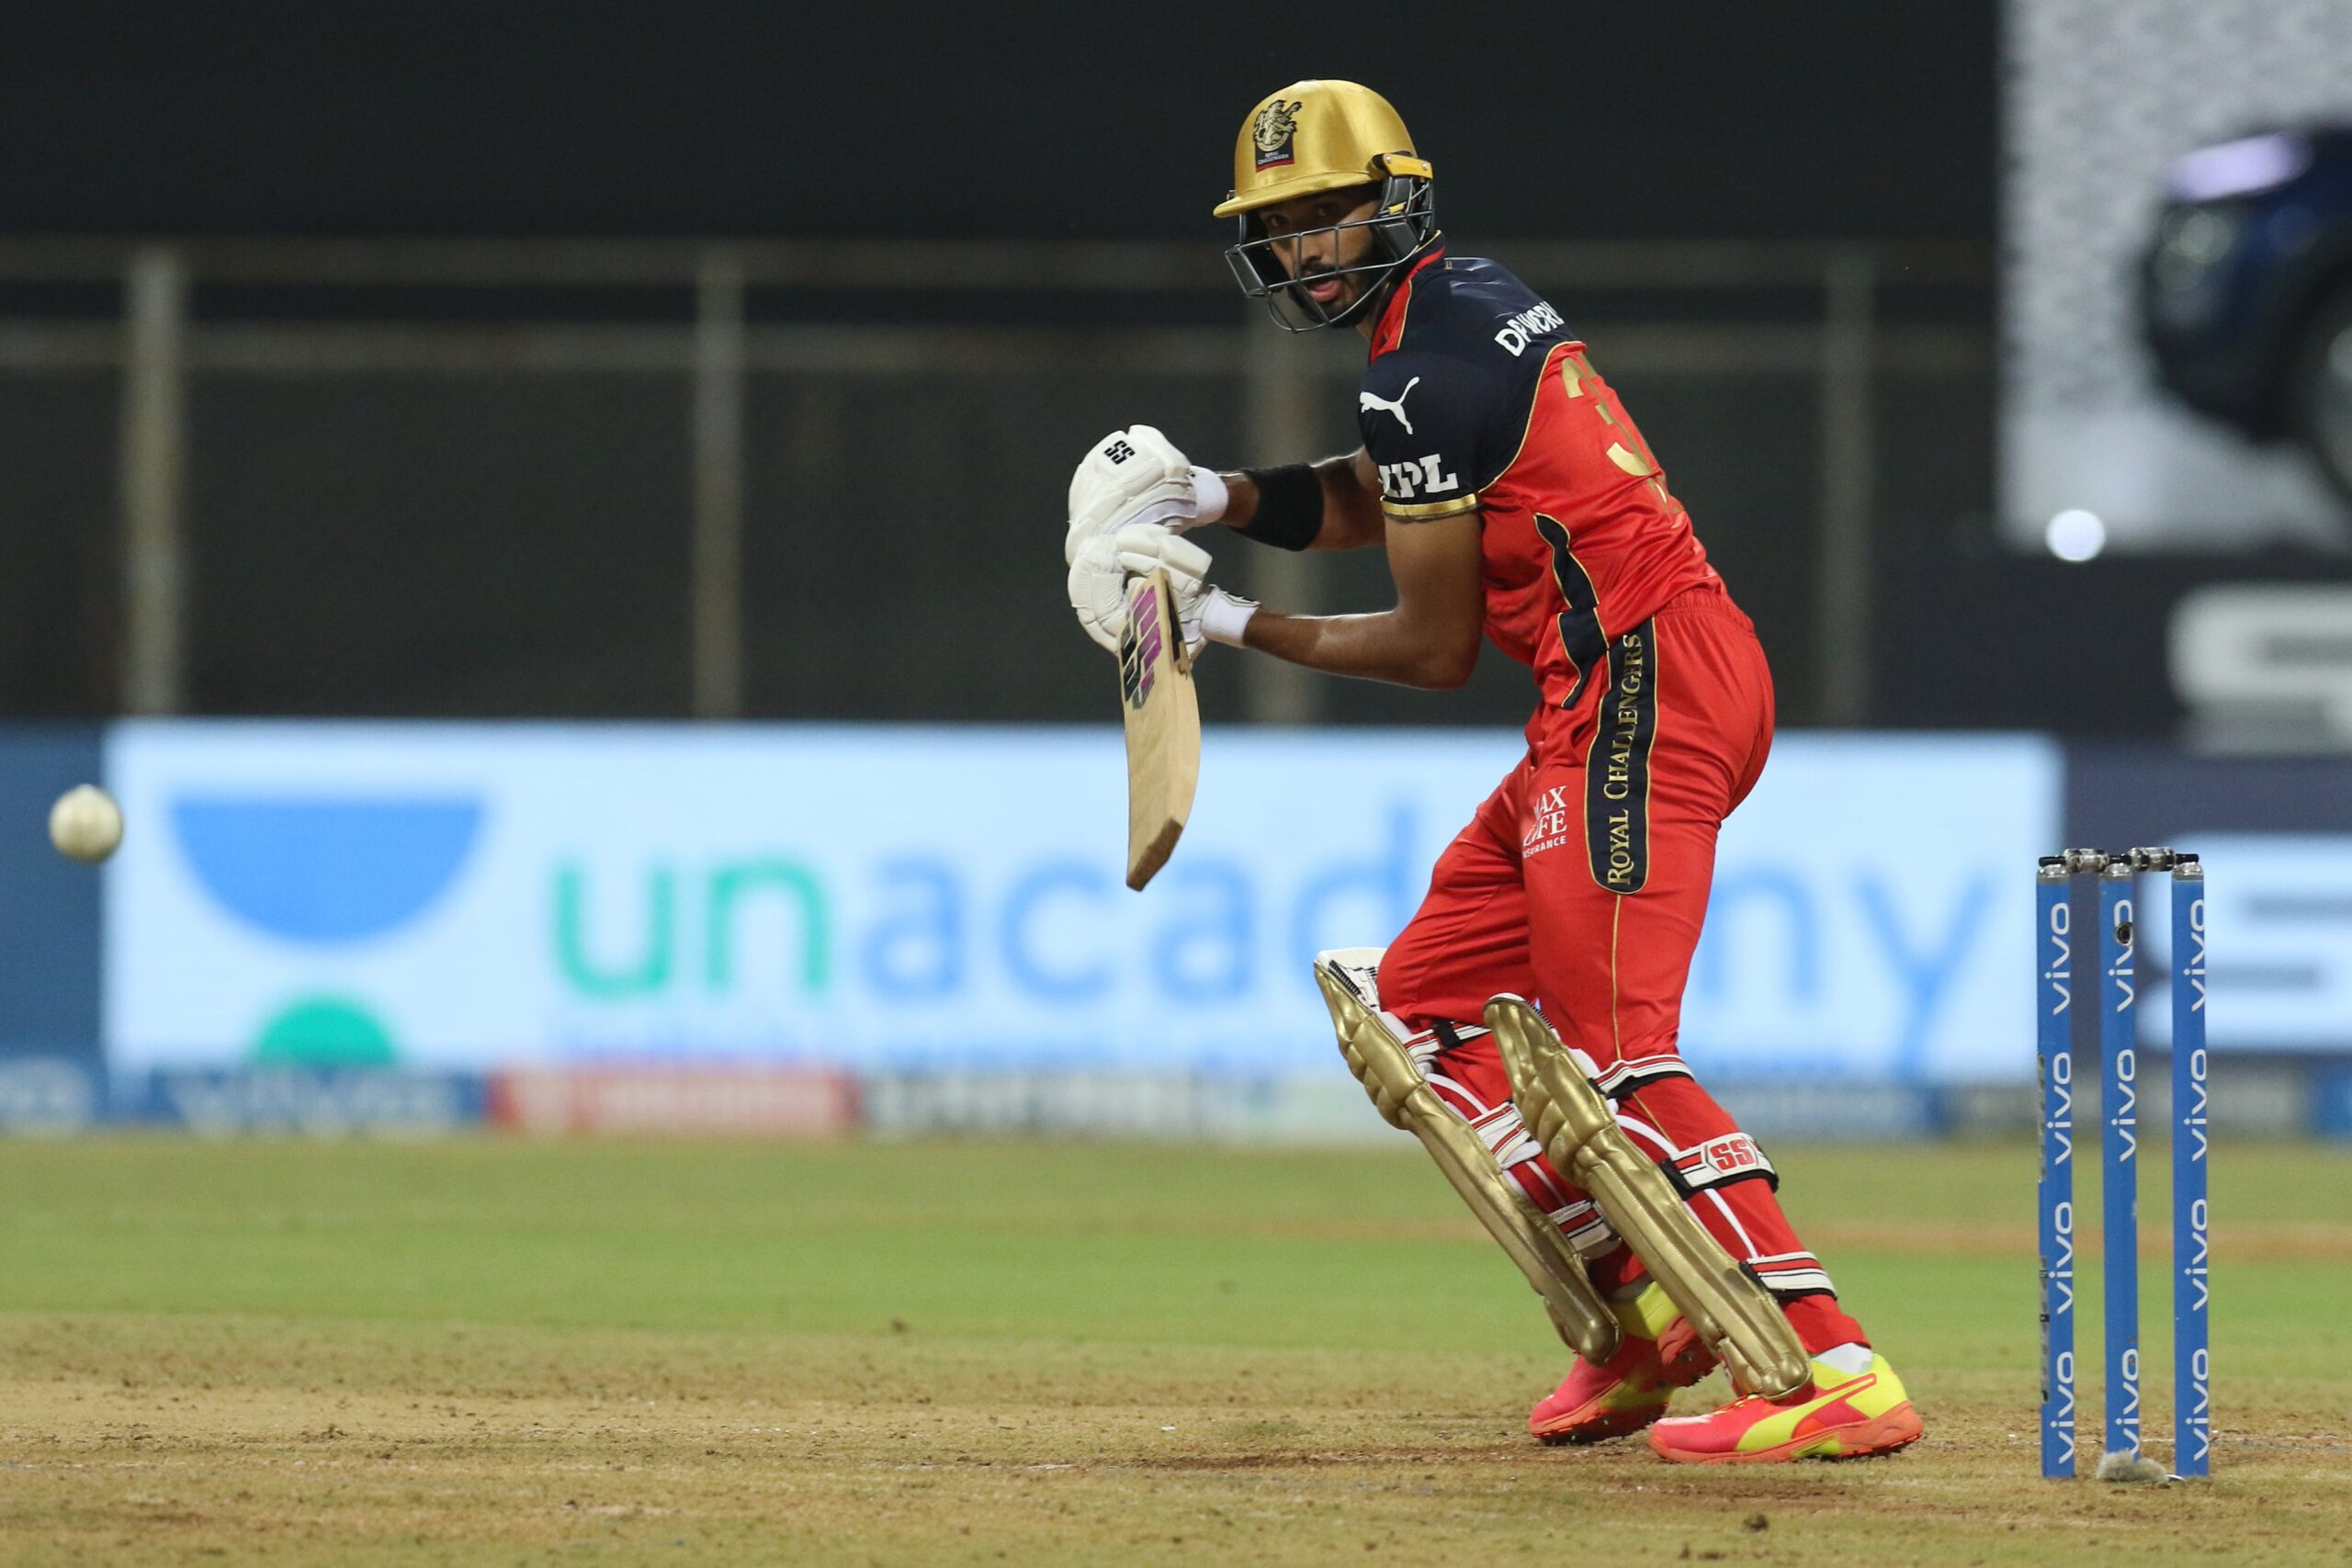 IPL 2021: Twitter Erupts As Devdutt Padikkal And Virat Kohli's Unbeaten 181-Run Stand Help Royal Challengers Bangalore Thump Rajasthan Royals By 10 Wickets